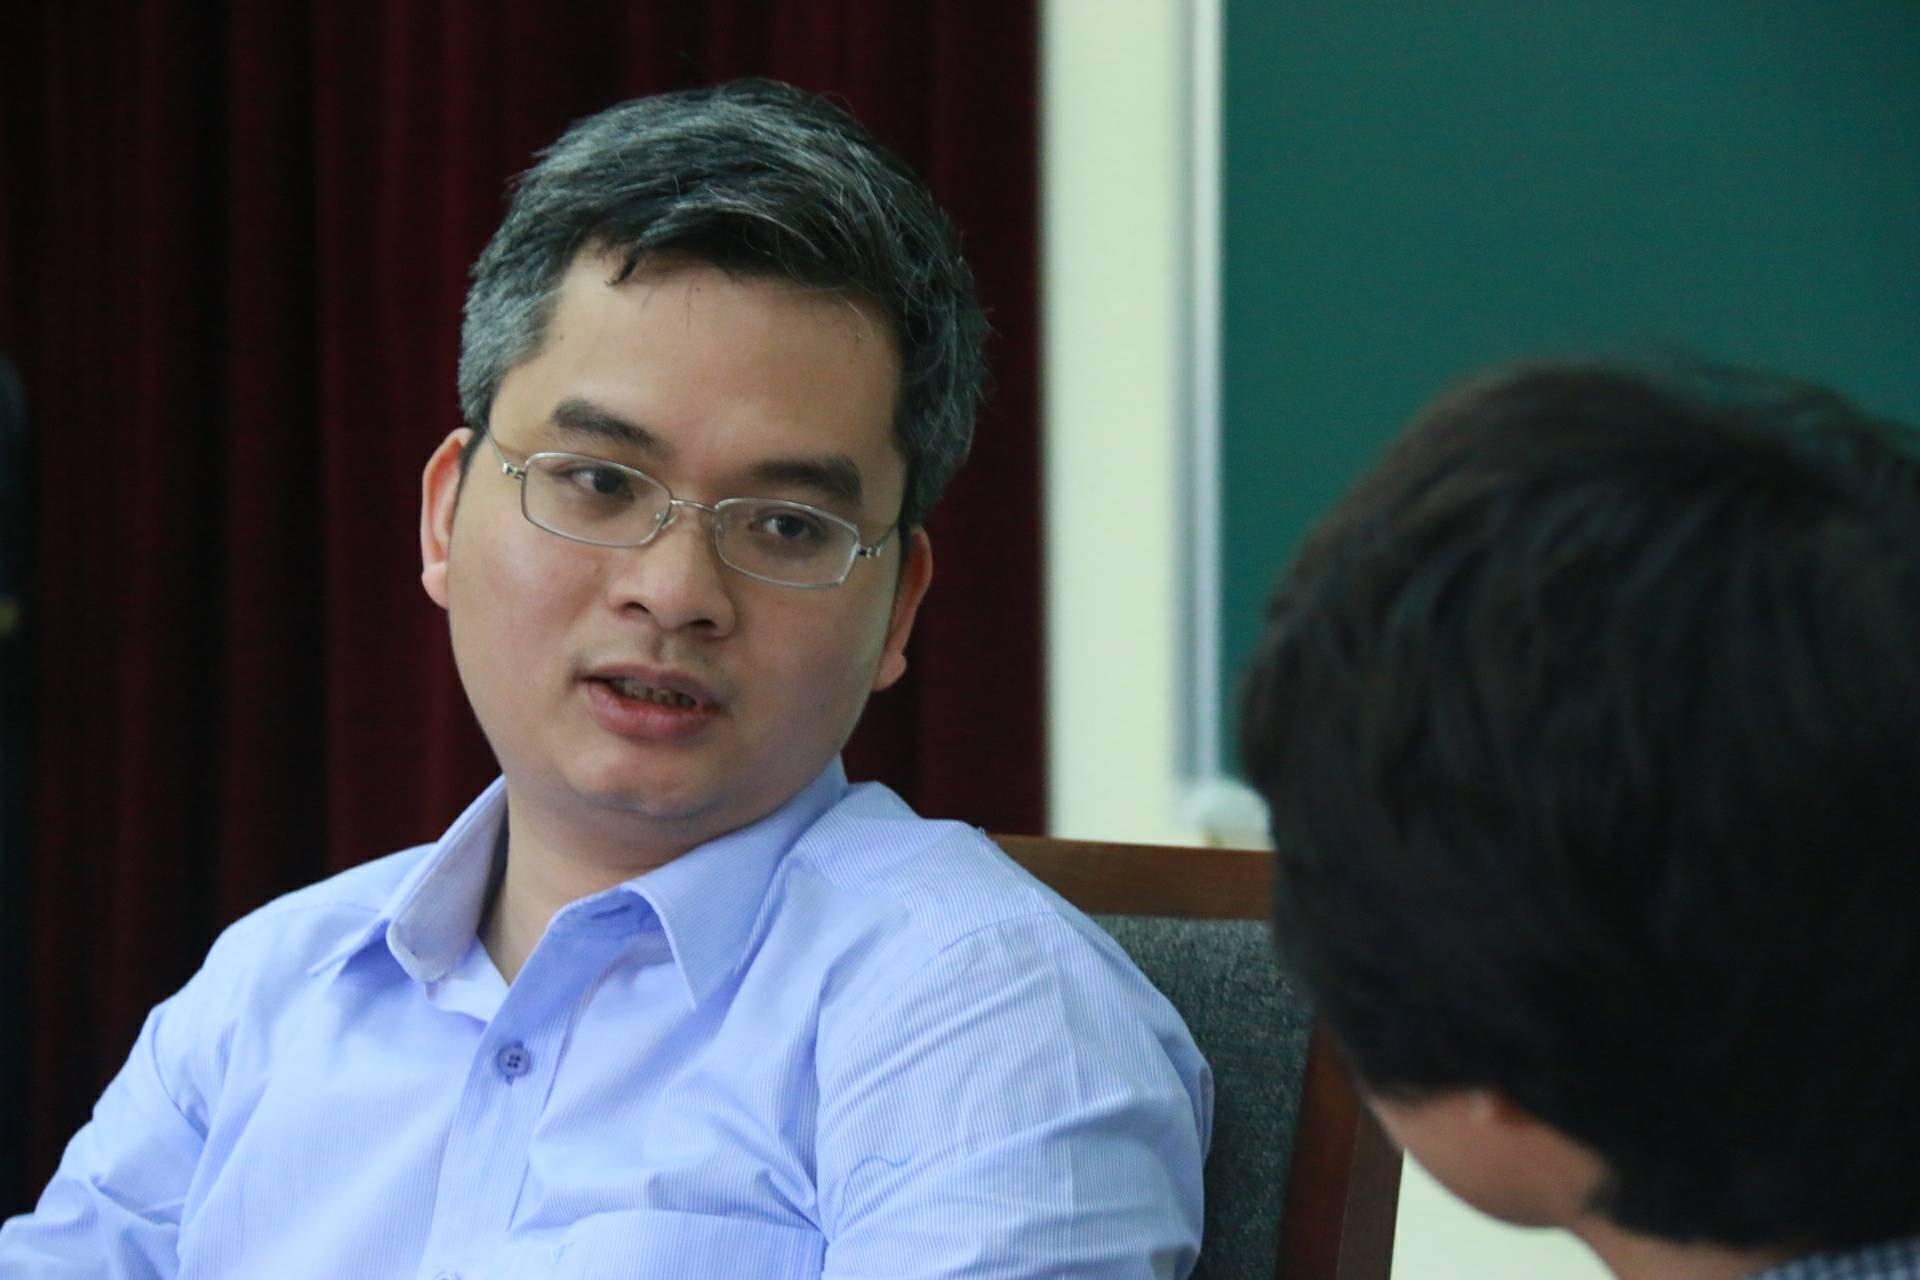 Gặp giáo sư 36 tuổi trẻ nhất Việt Nam-2